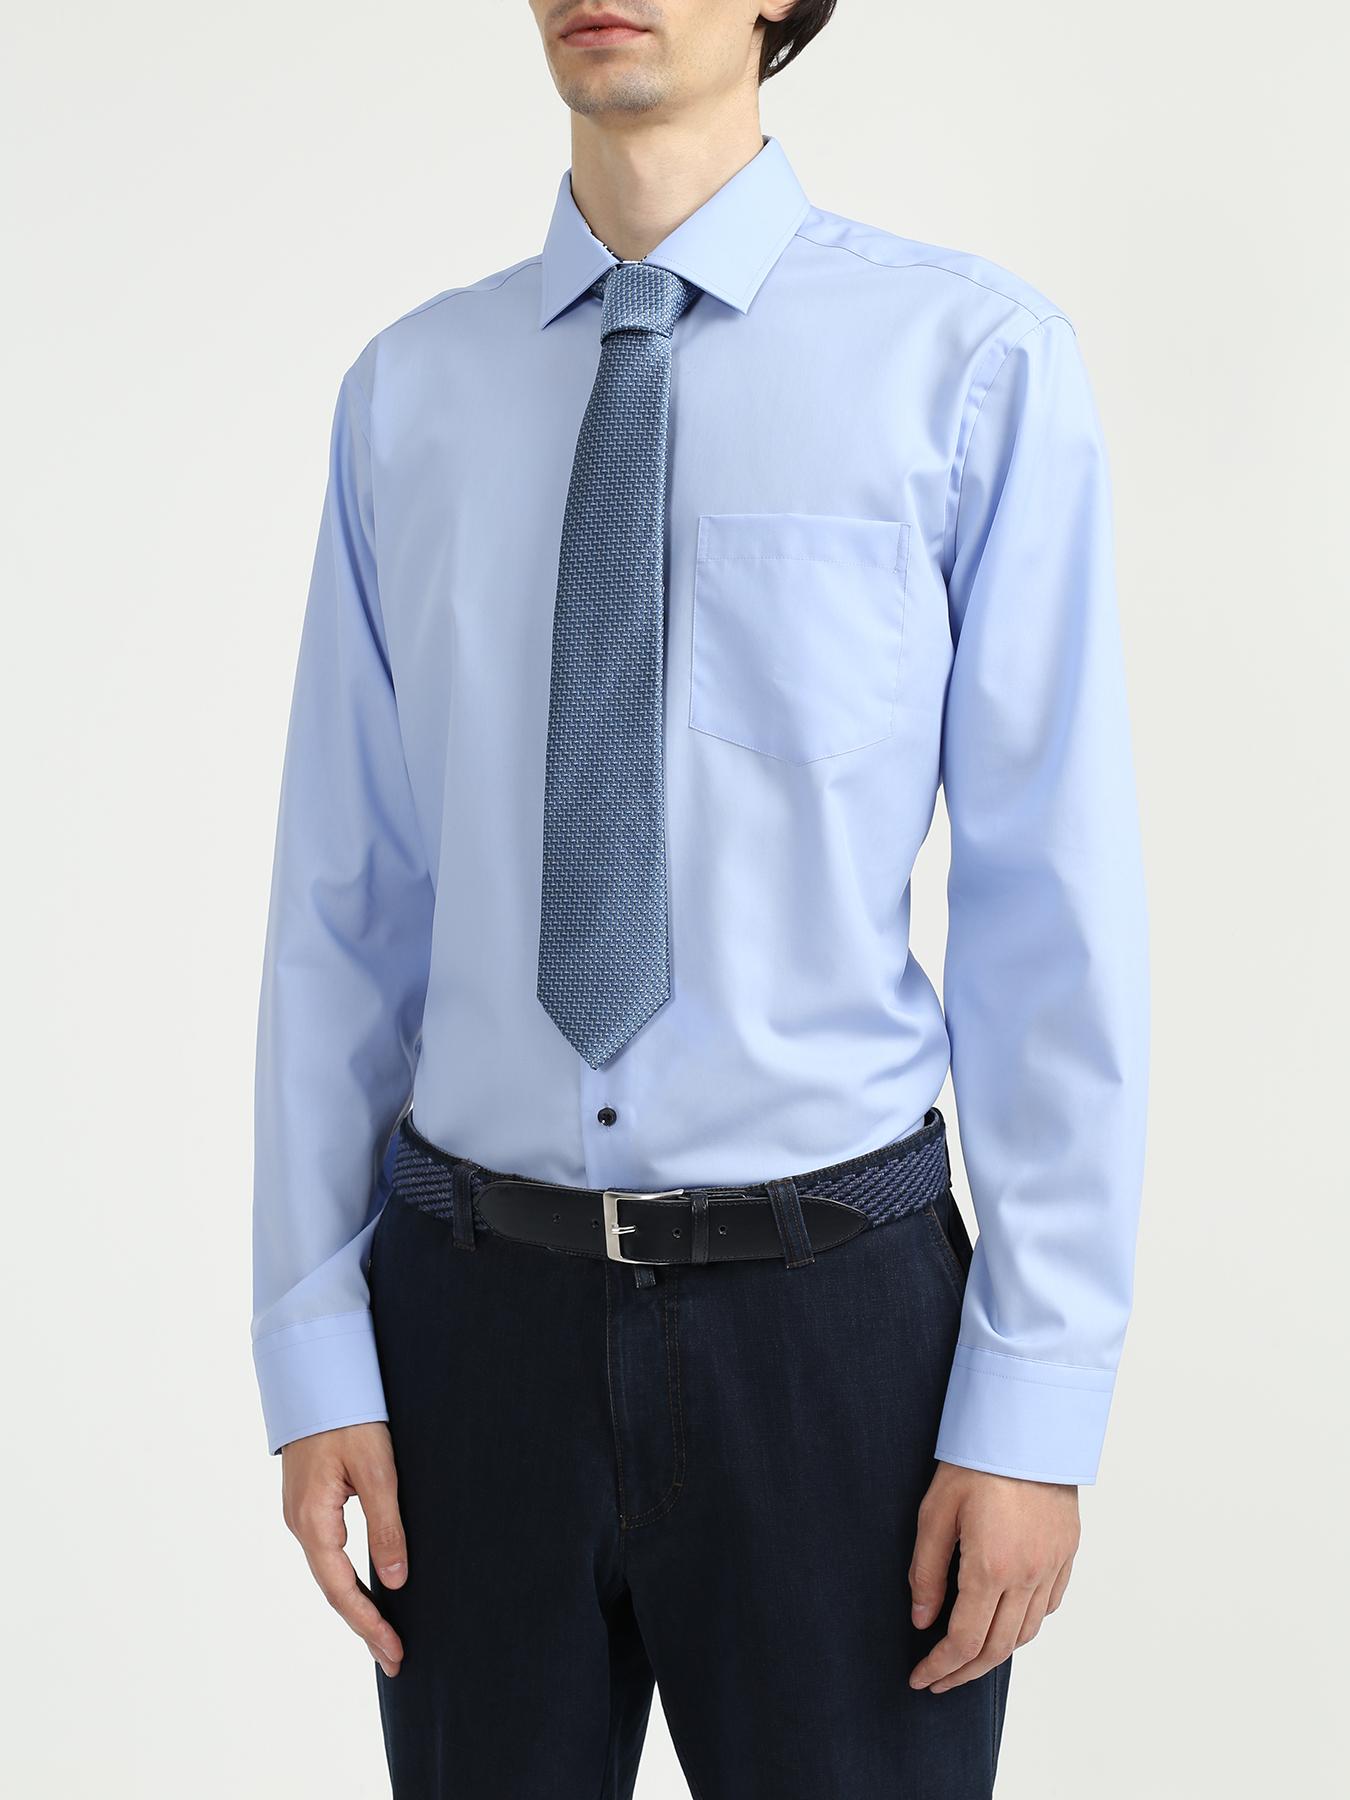 Alessandro Manzoni Шелковый галстук 312361-185